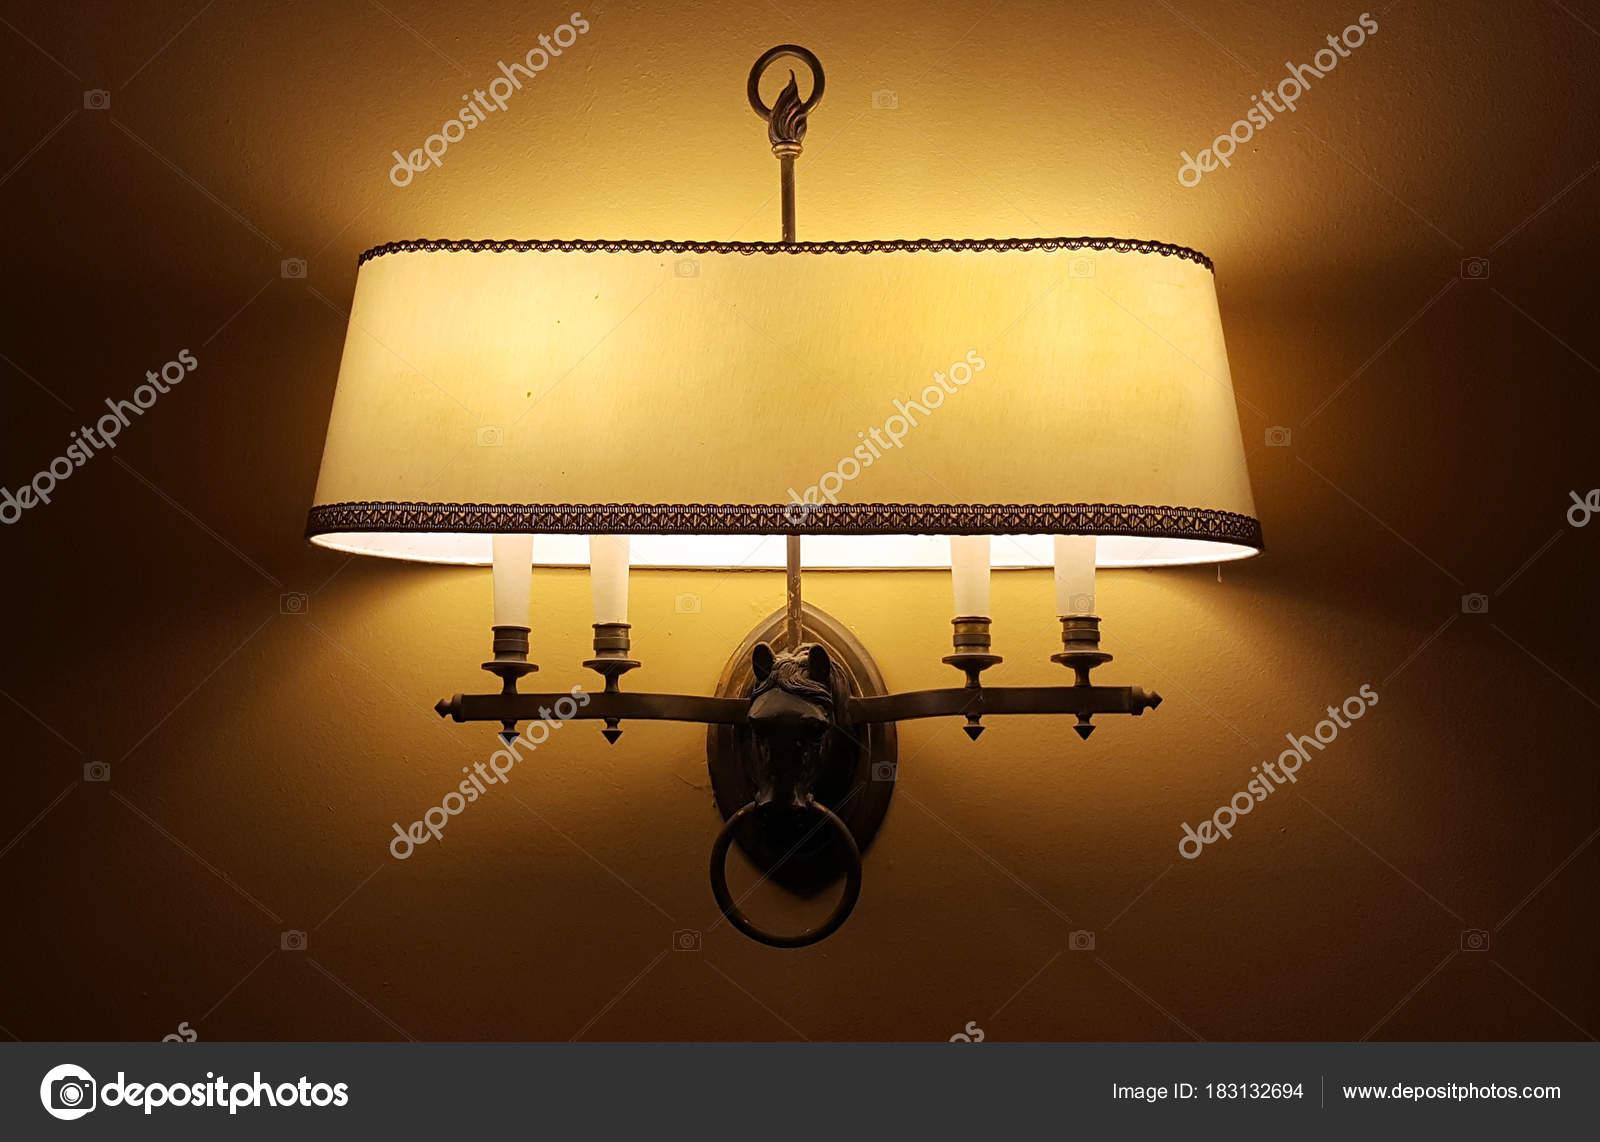 Lampada Vintage Da Parete : Vecchia lampada da parete vintage u2014 foto stock © roxanabalint #183132694